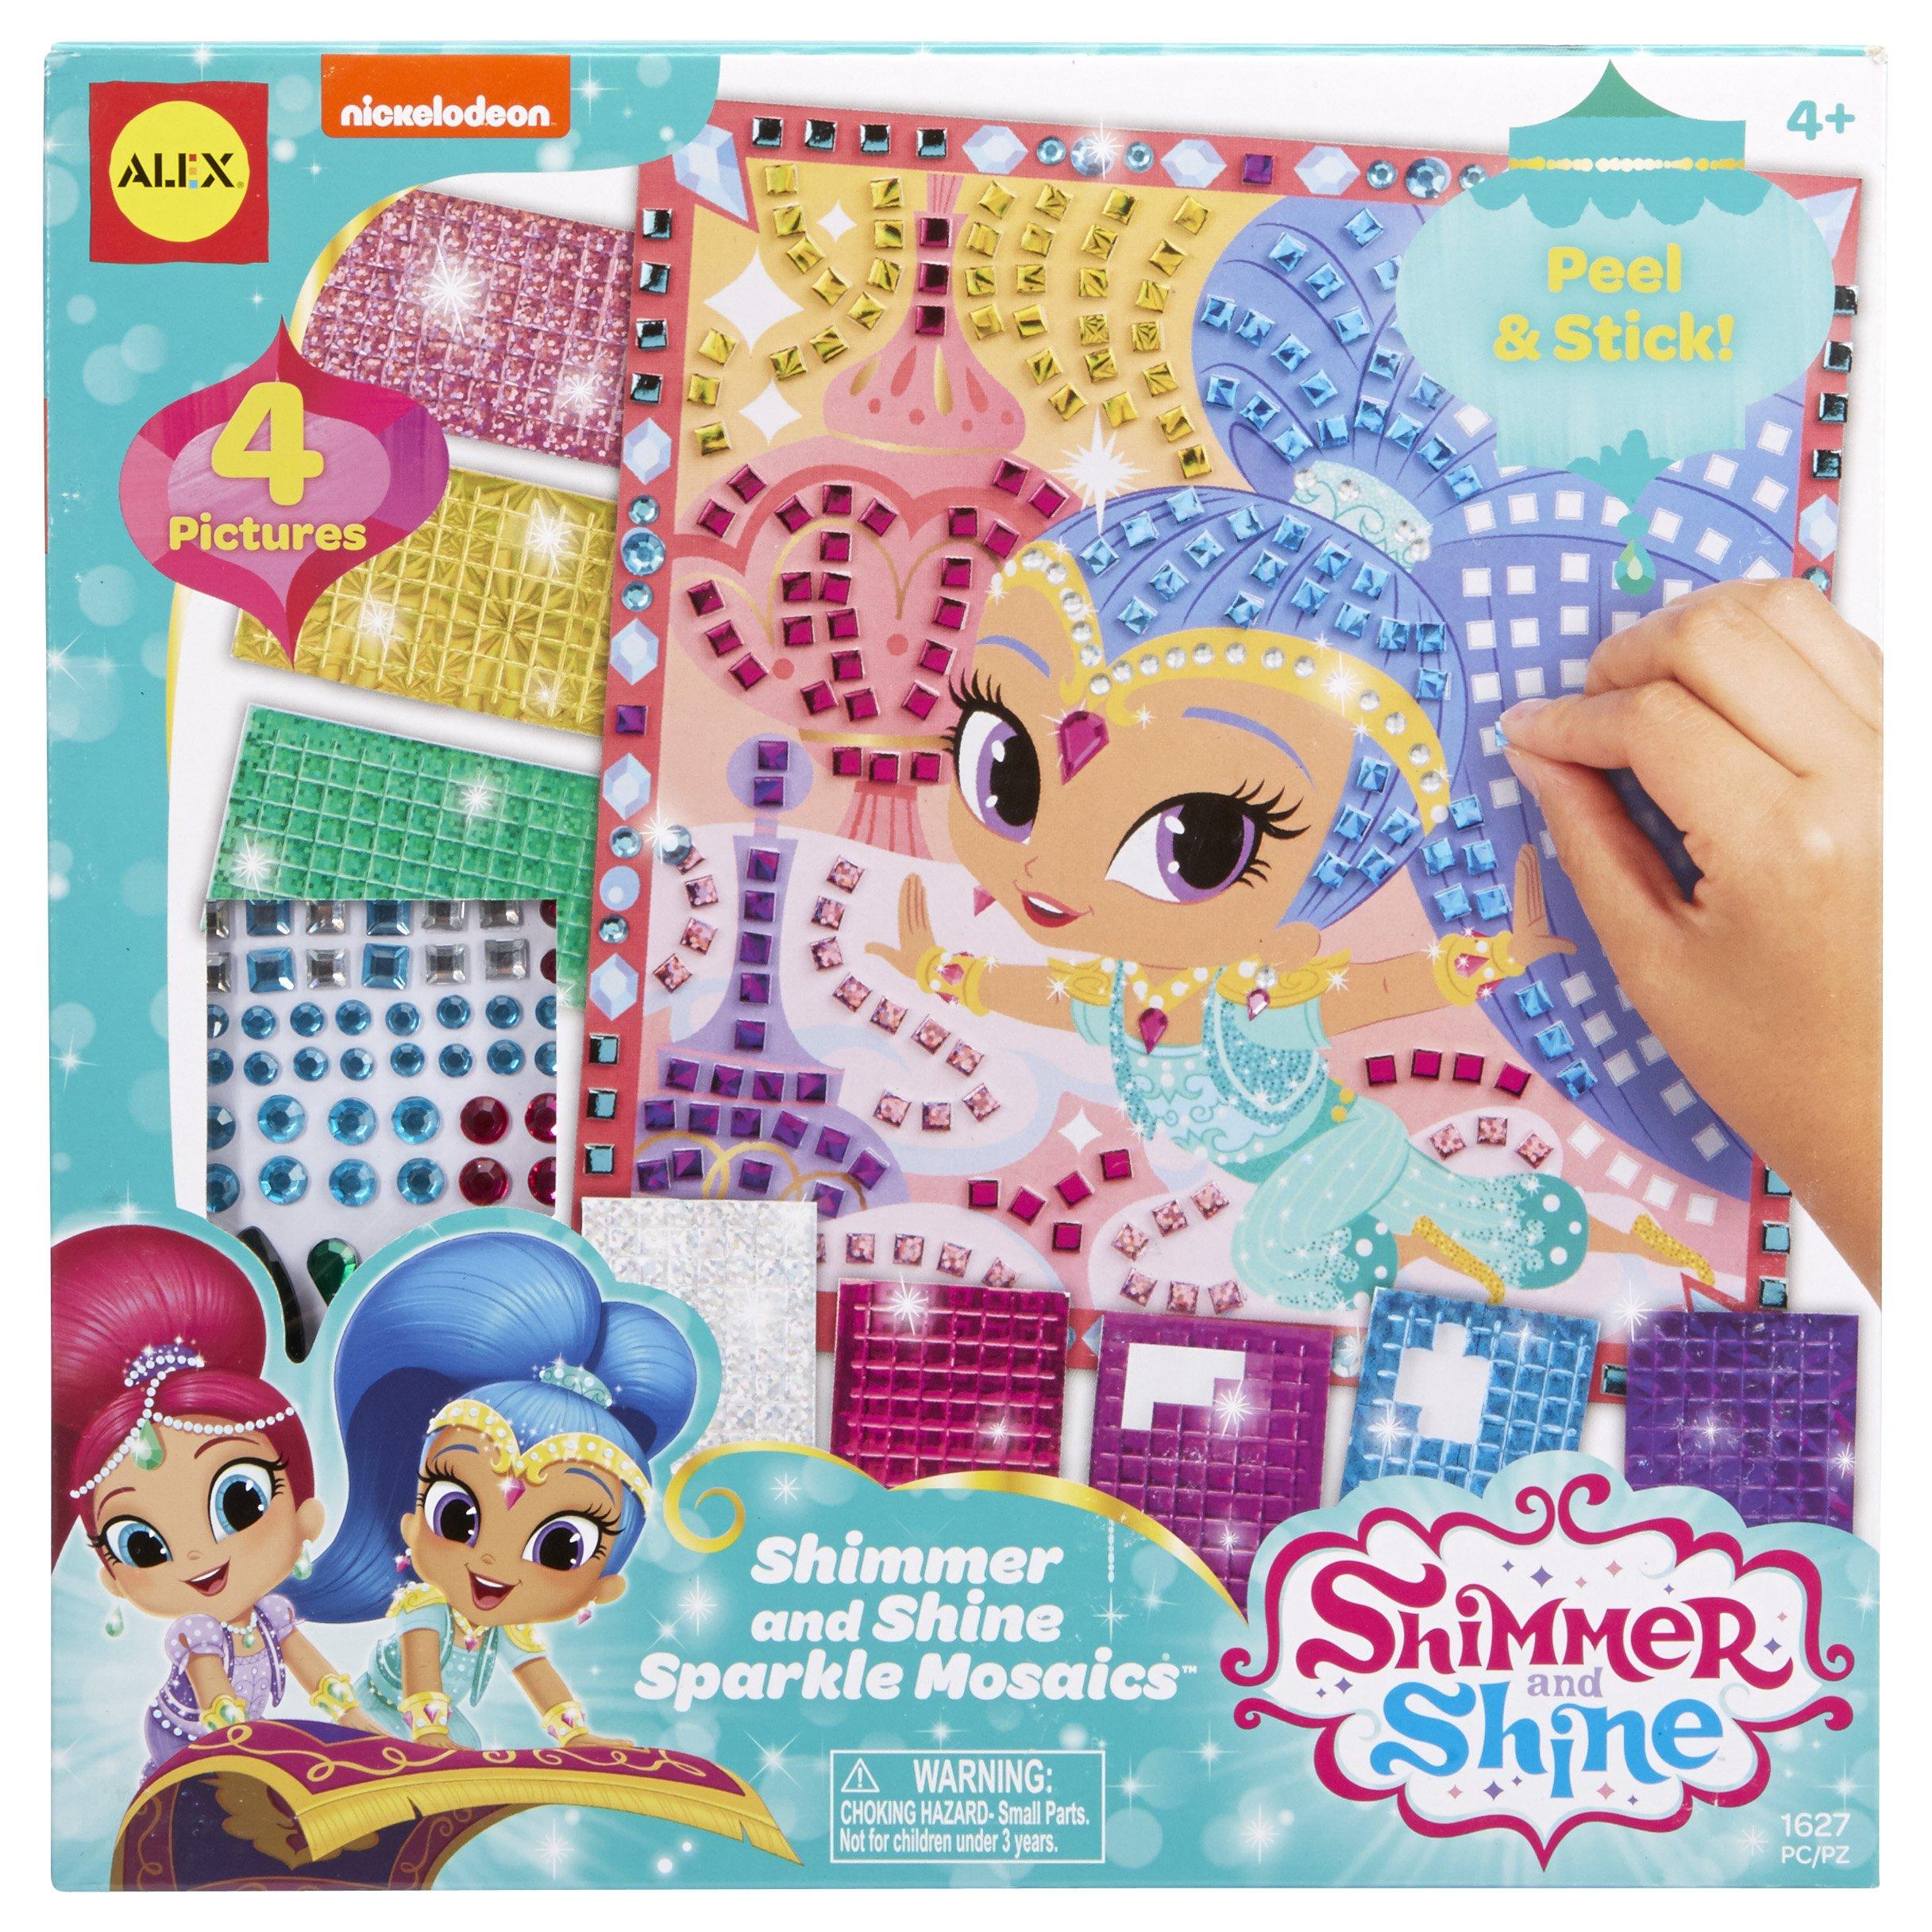 Shimmer and Shine Sparkle Mosaics